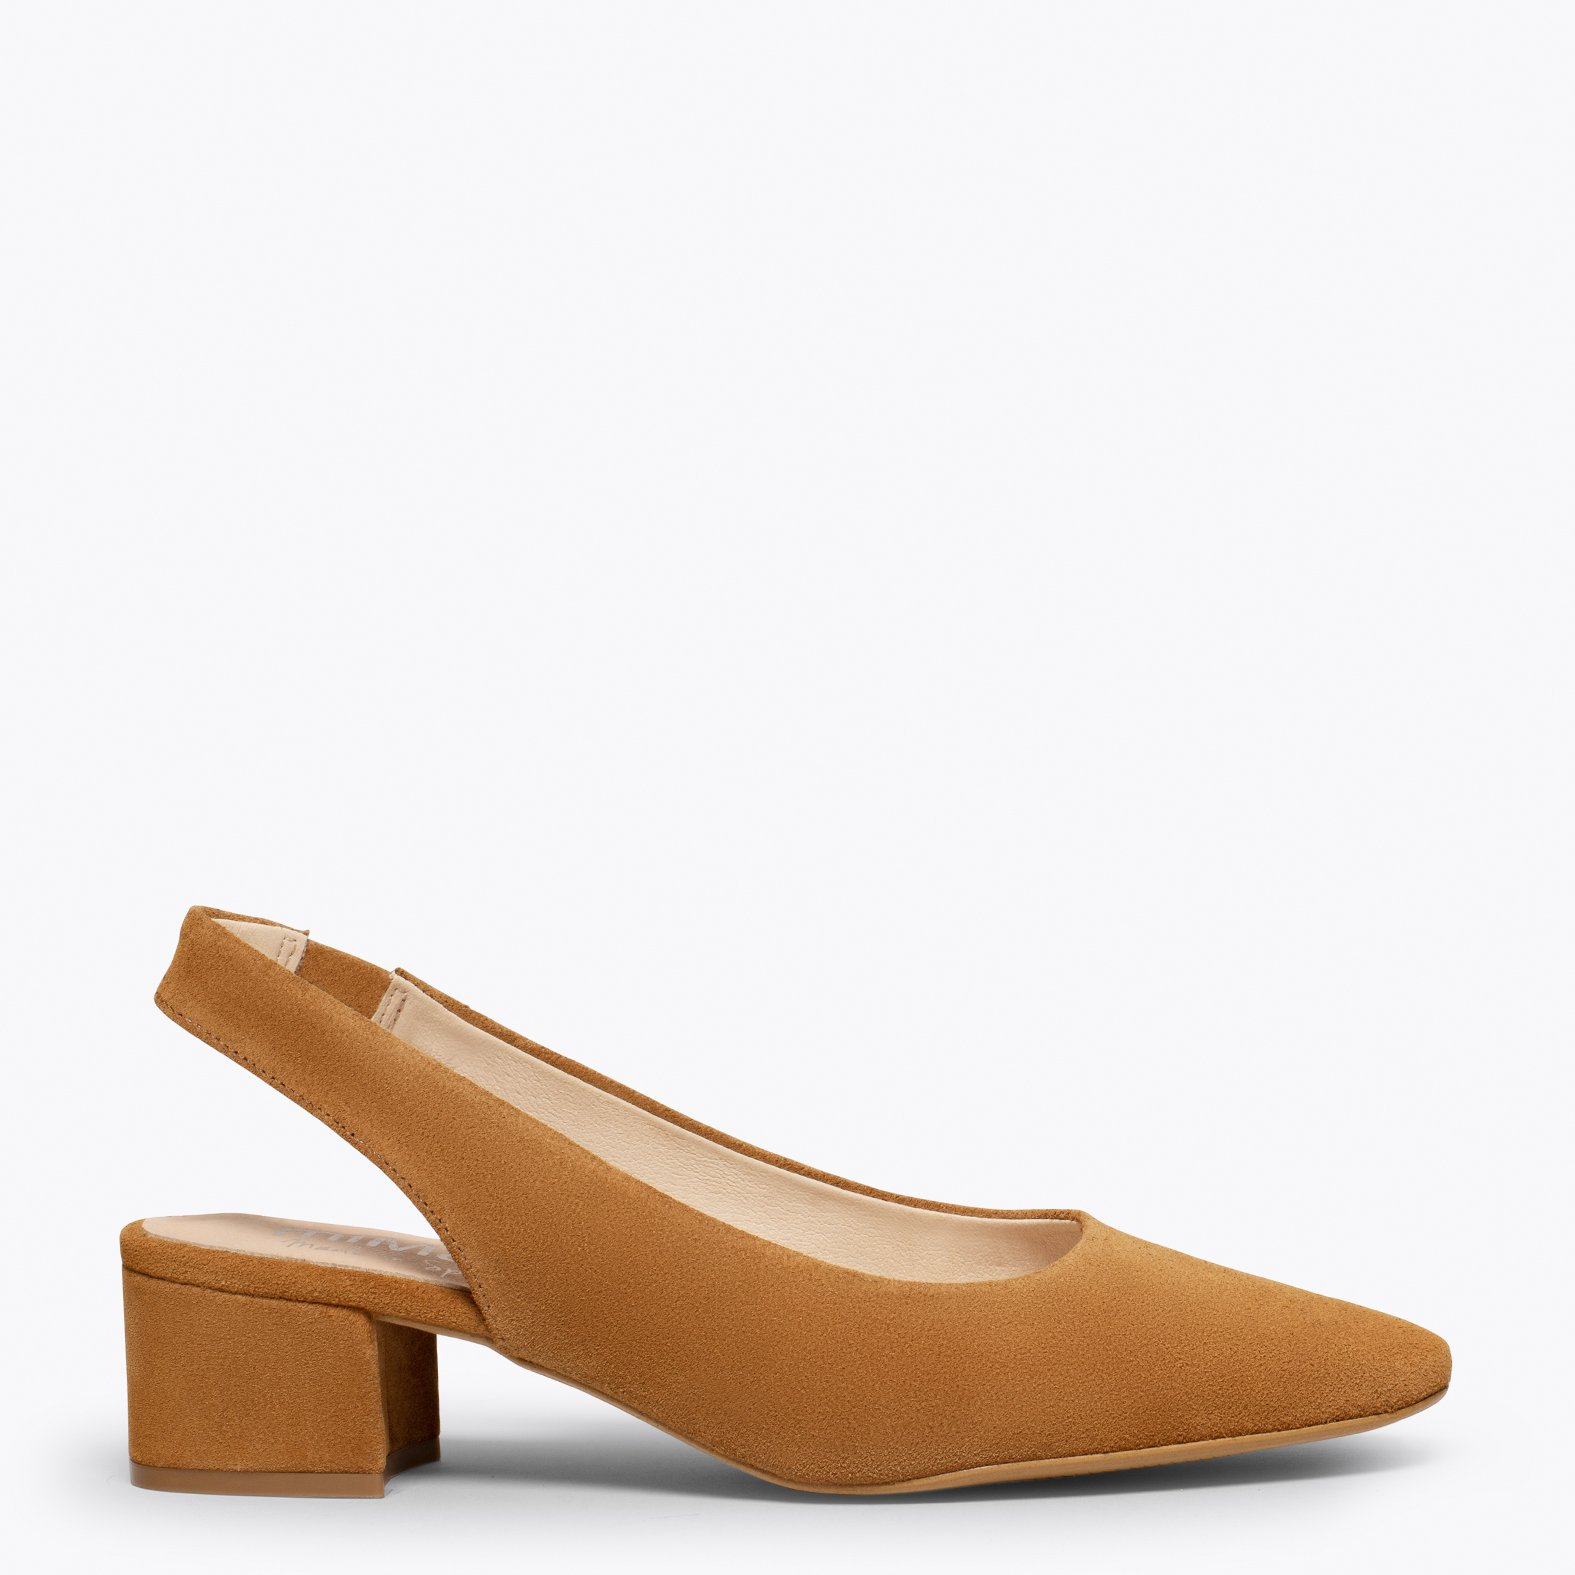 LADY Zapato destalonado con puntera cuadrada CUERO